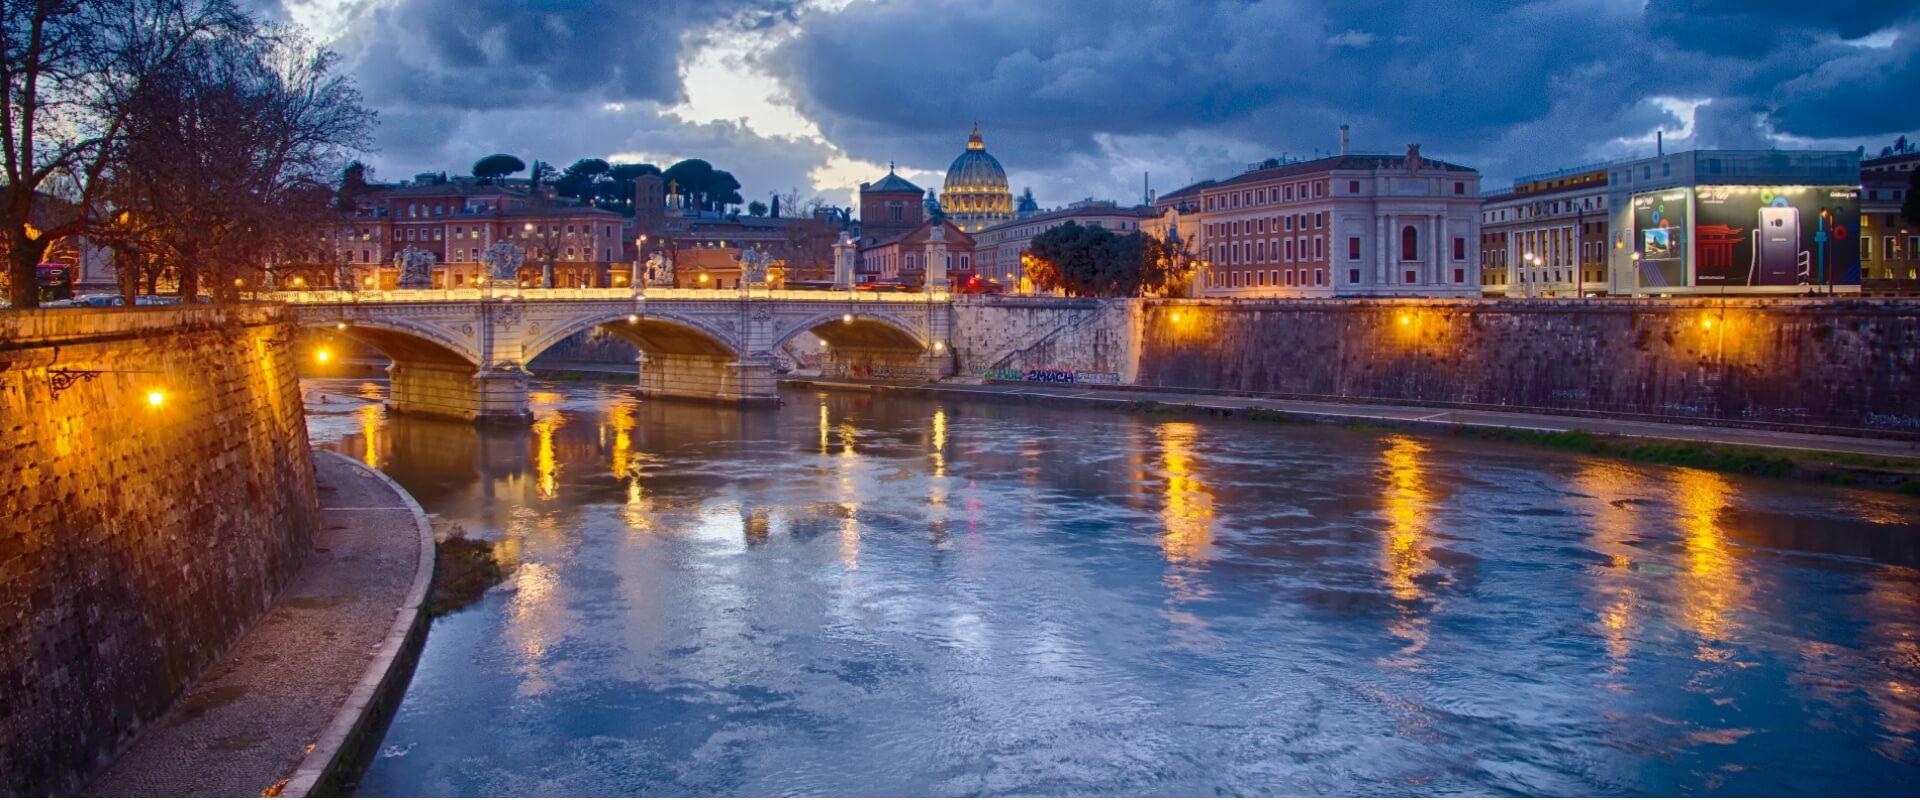 Night Tour in Rome